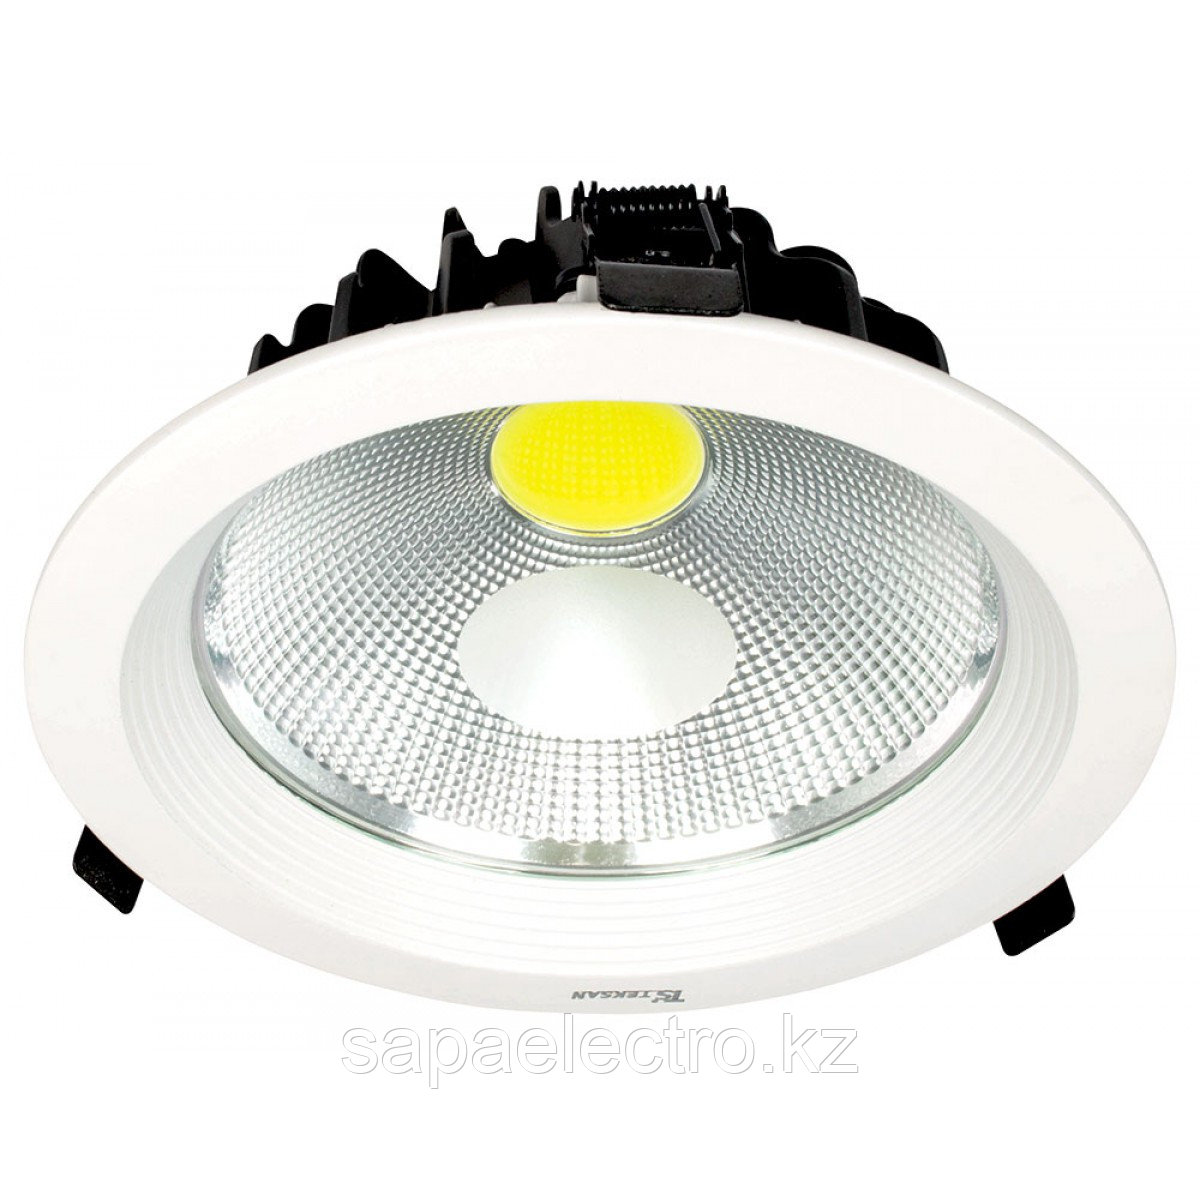 Свет-к DOWNLIGHT LED TD6101 20W 5000K (TEKSAN)24шт